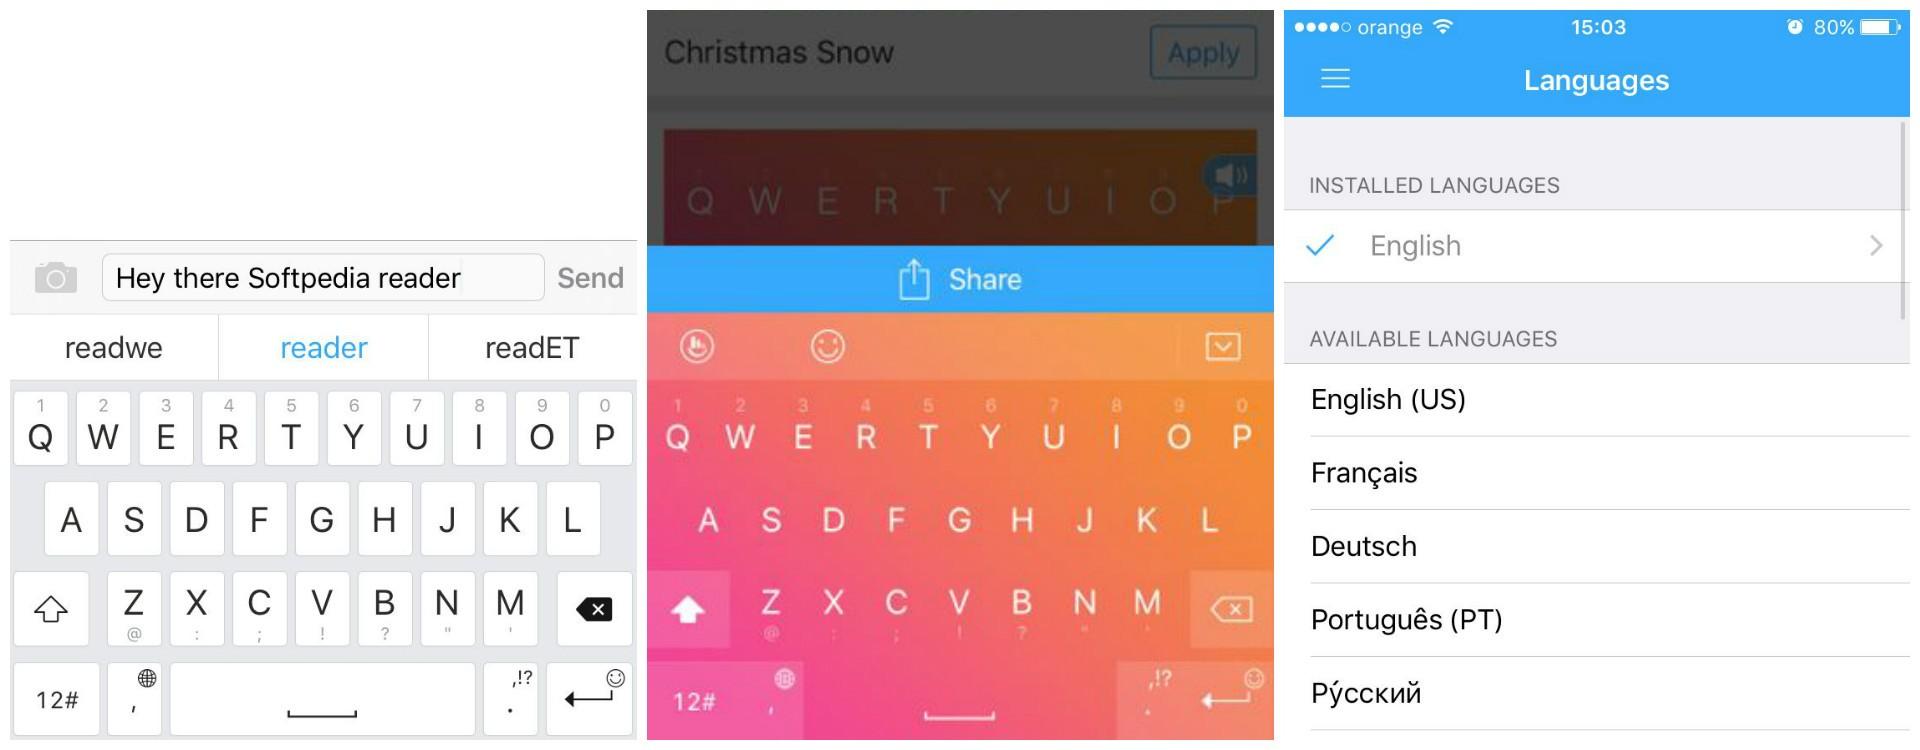 Best Alternatives to Microsoft's SwiftKey Keyboard on iPhone